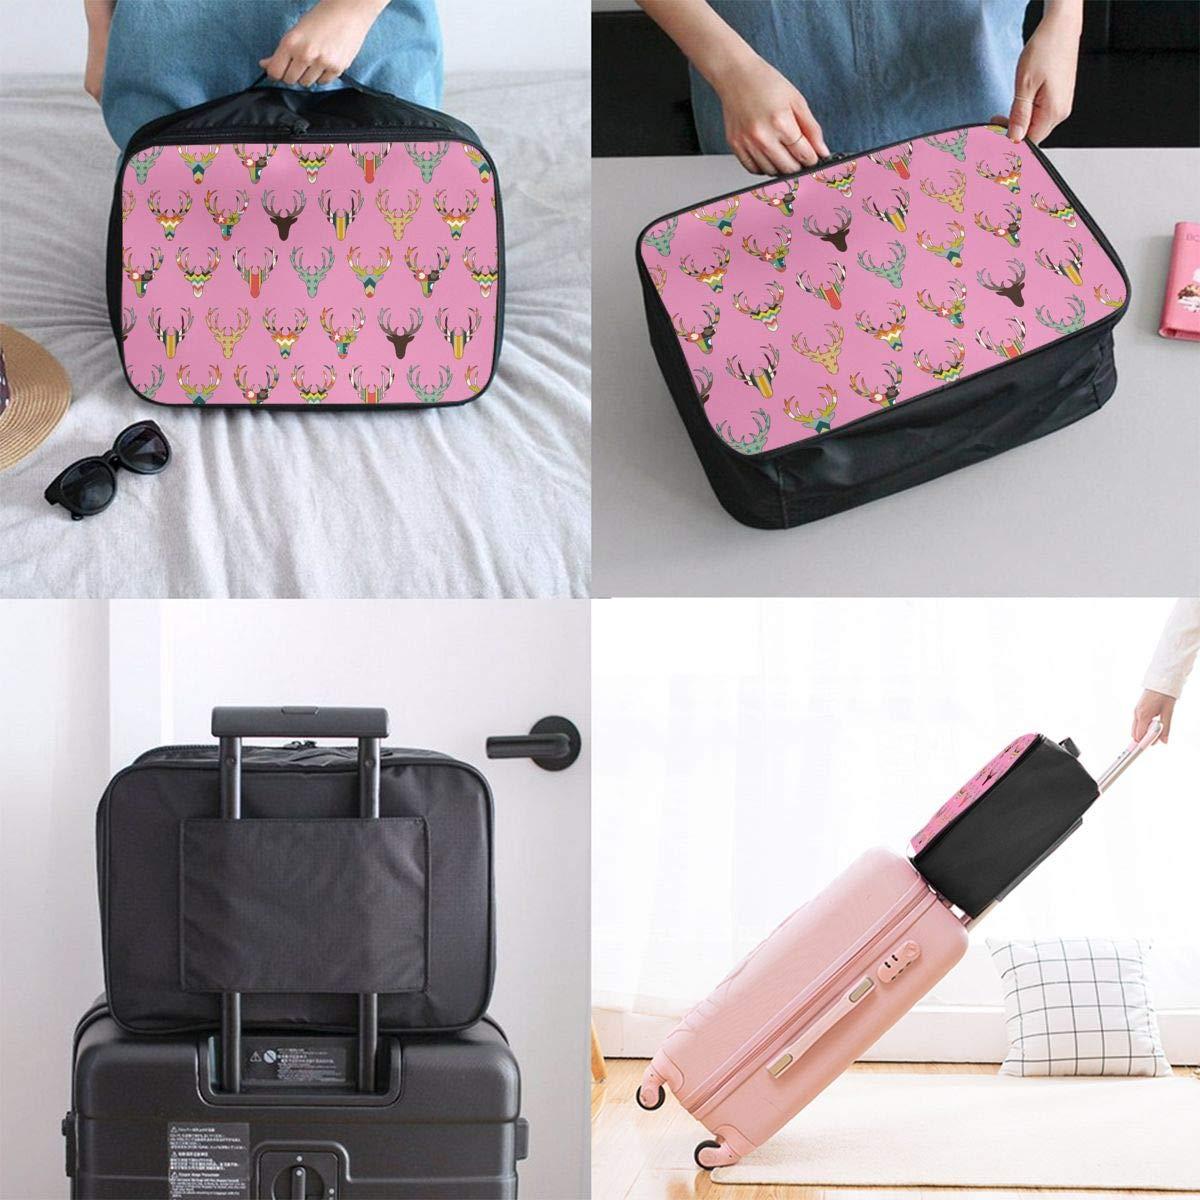 YueLJB Retro Deer Head Lightweight Large Capacity Portable Luggage Bag Travel Duffel Bag Storage Carry Luggage Duffle Tote Bag